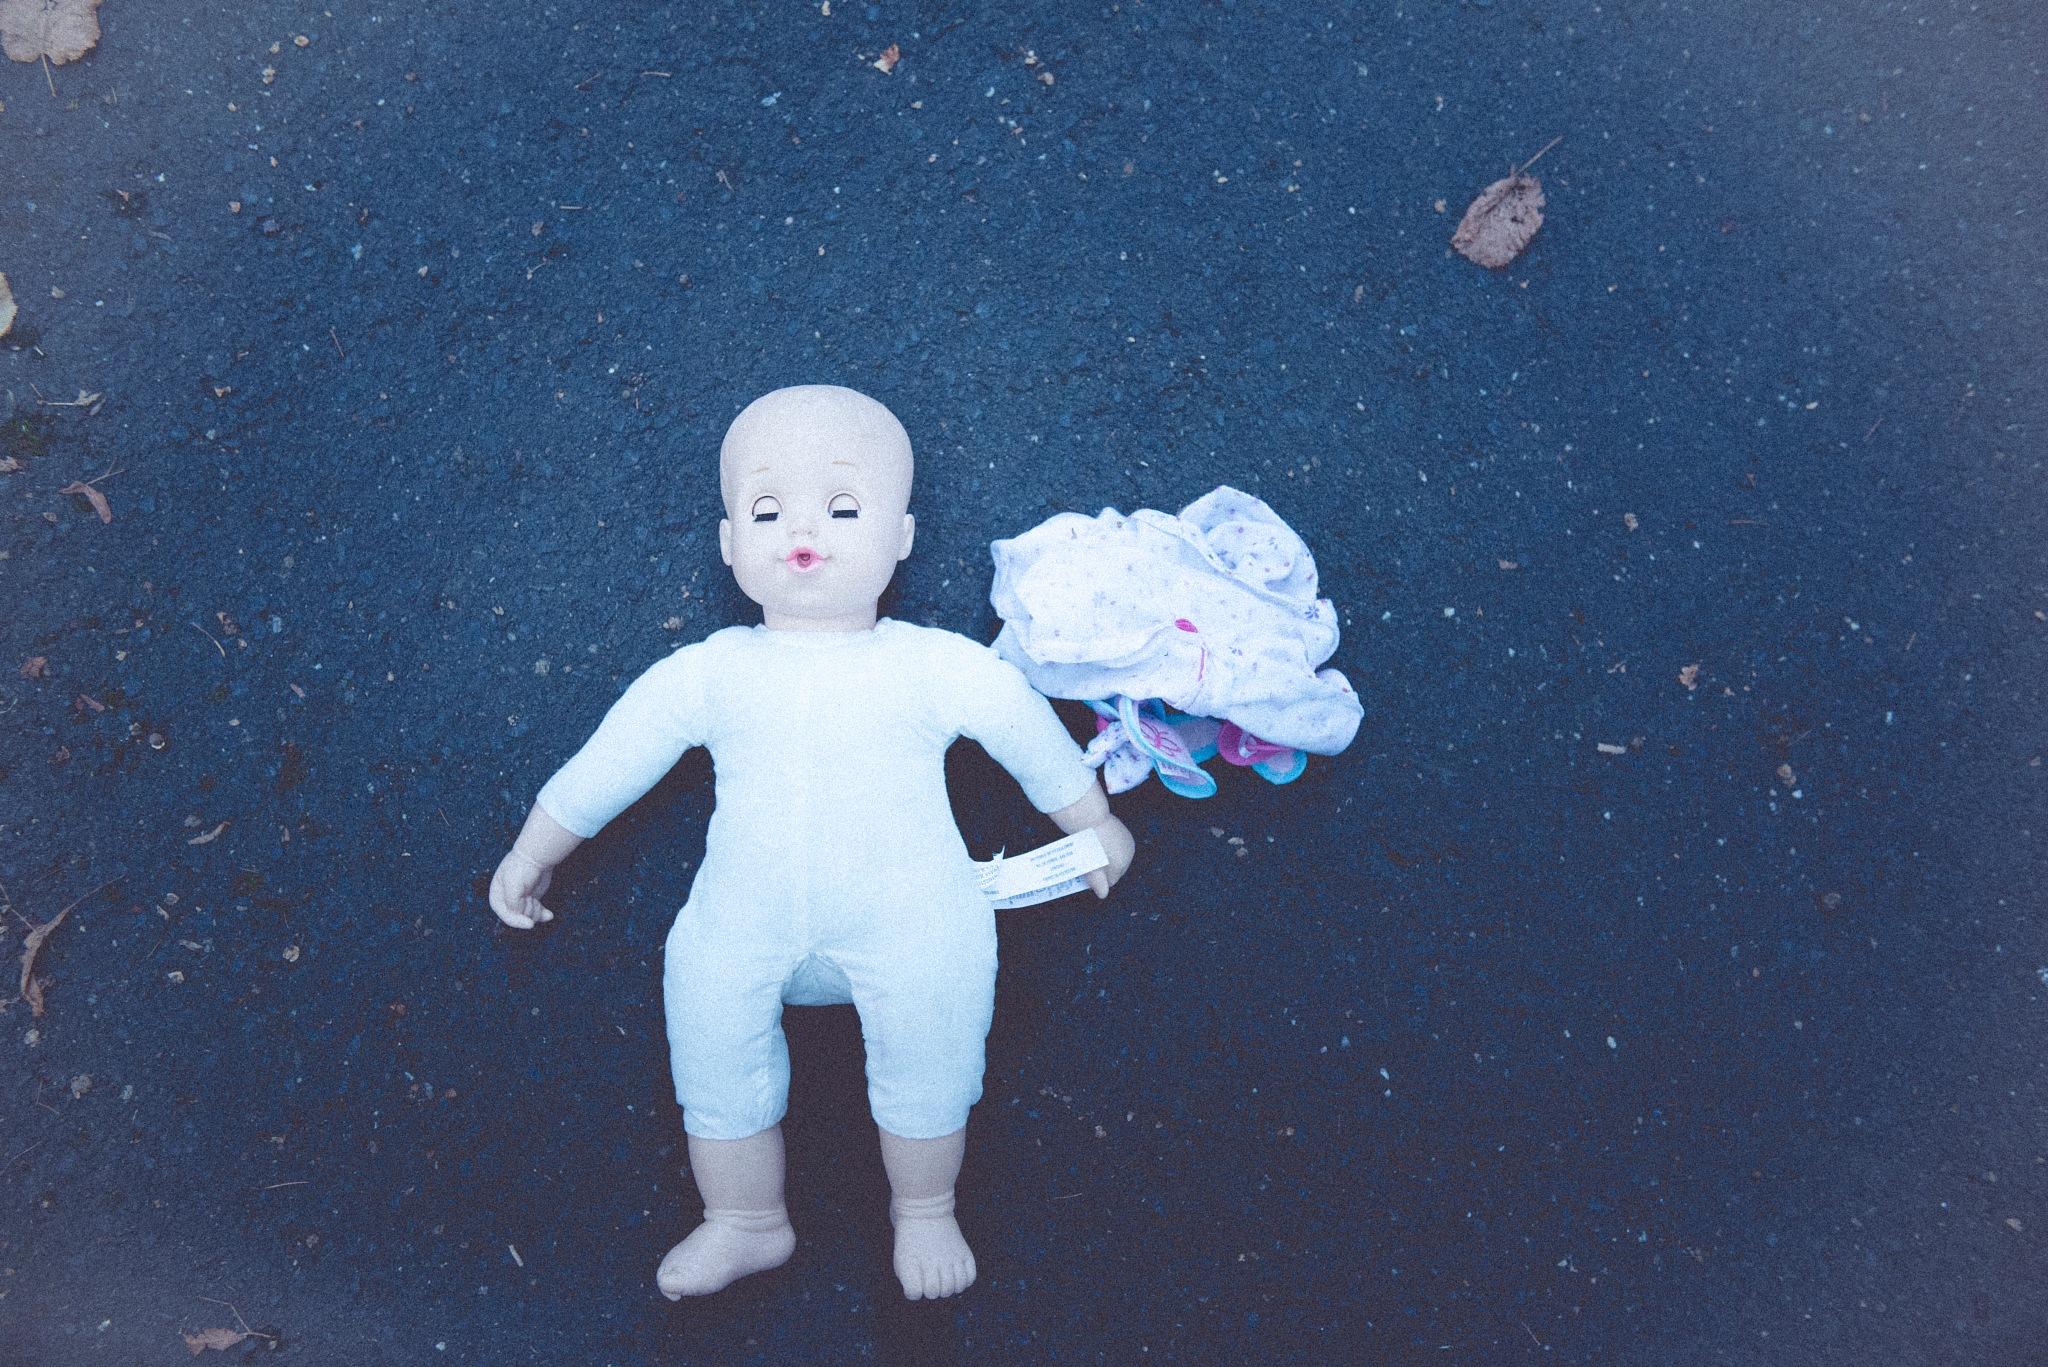 The Doll by Joachim Lehmann